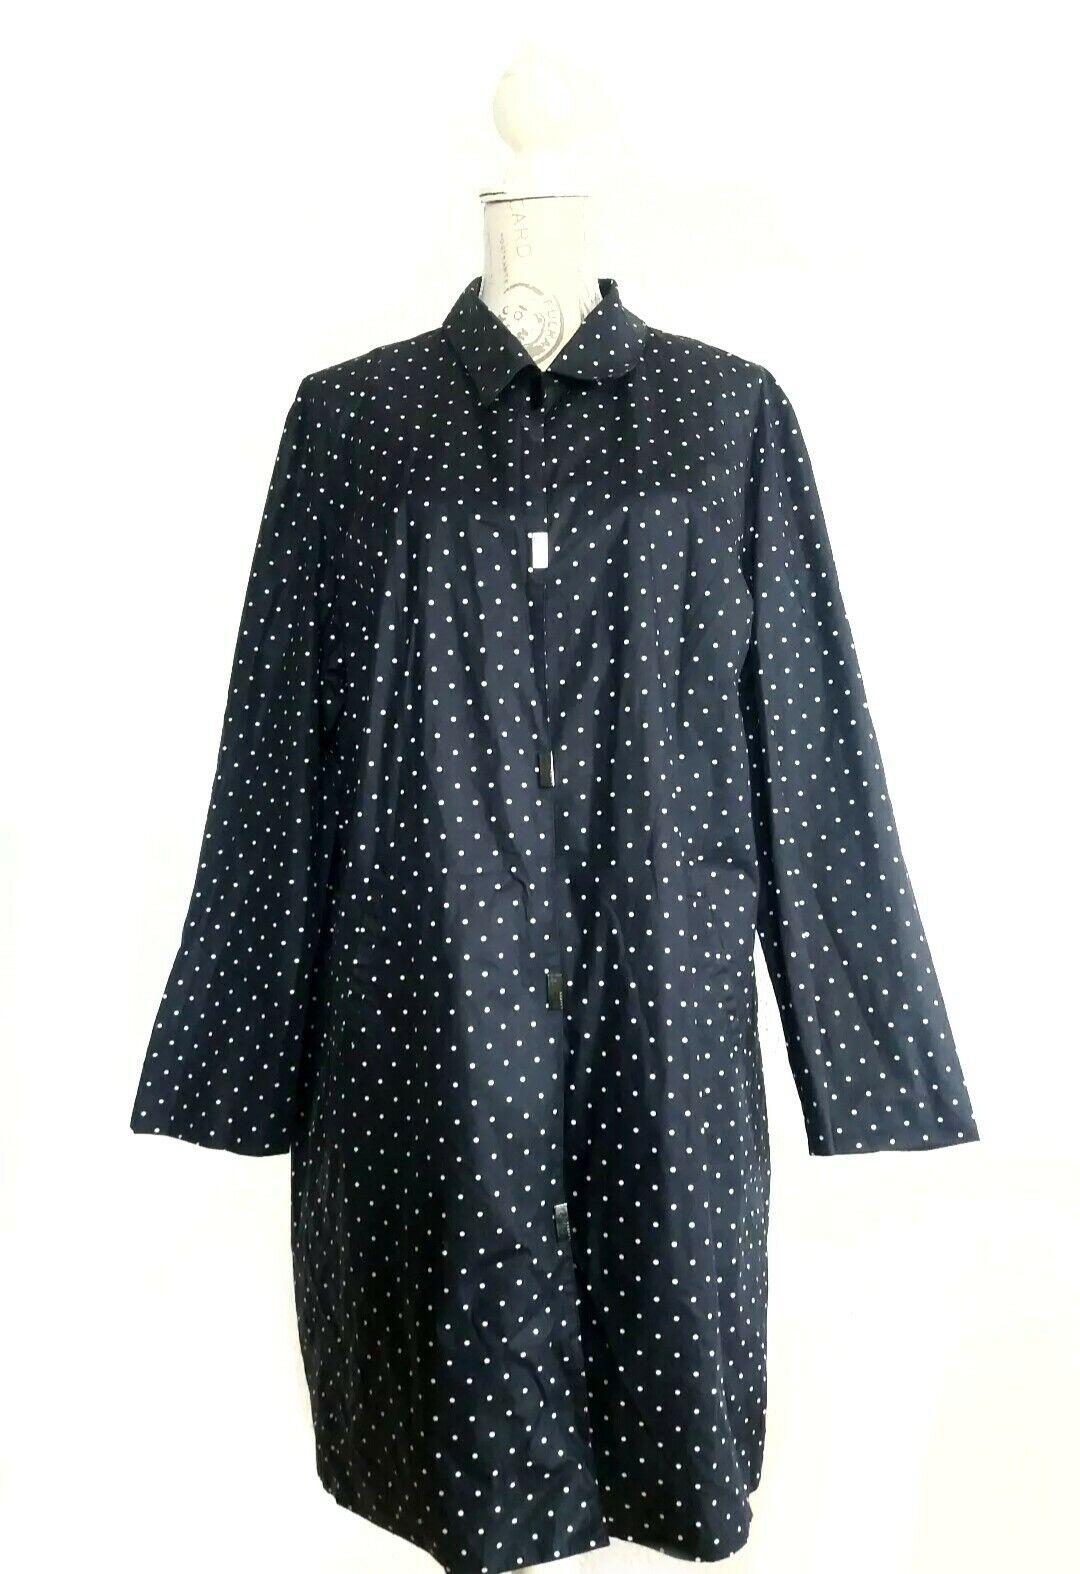 Ralph Lauren abrigo trench coat  talla d44 46 azul oscuro polka dot  Descuento del 70% barato